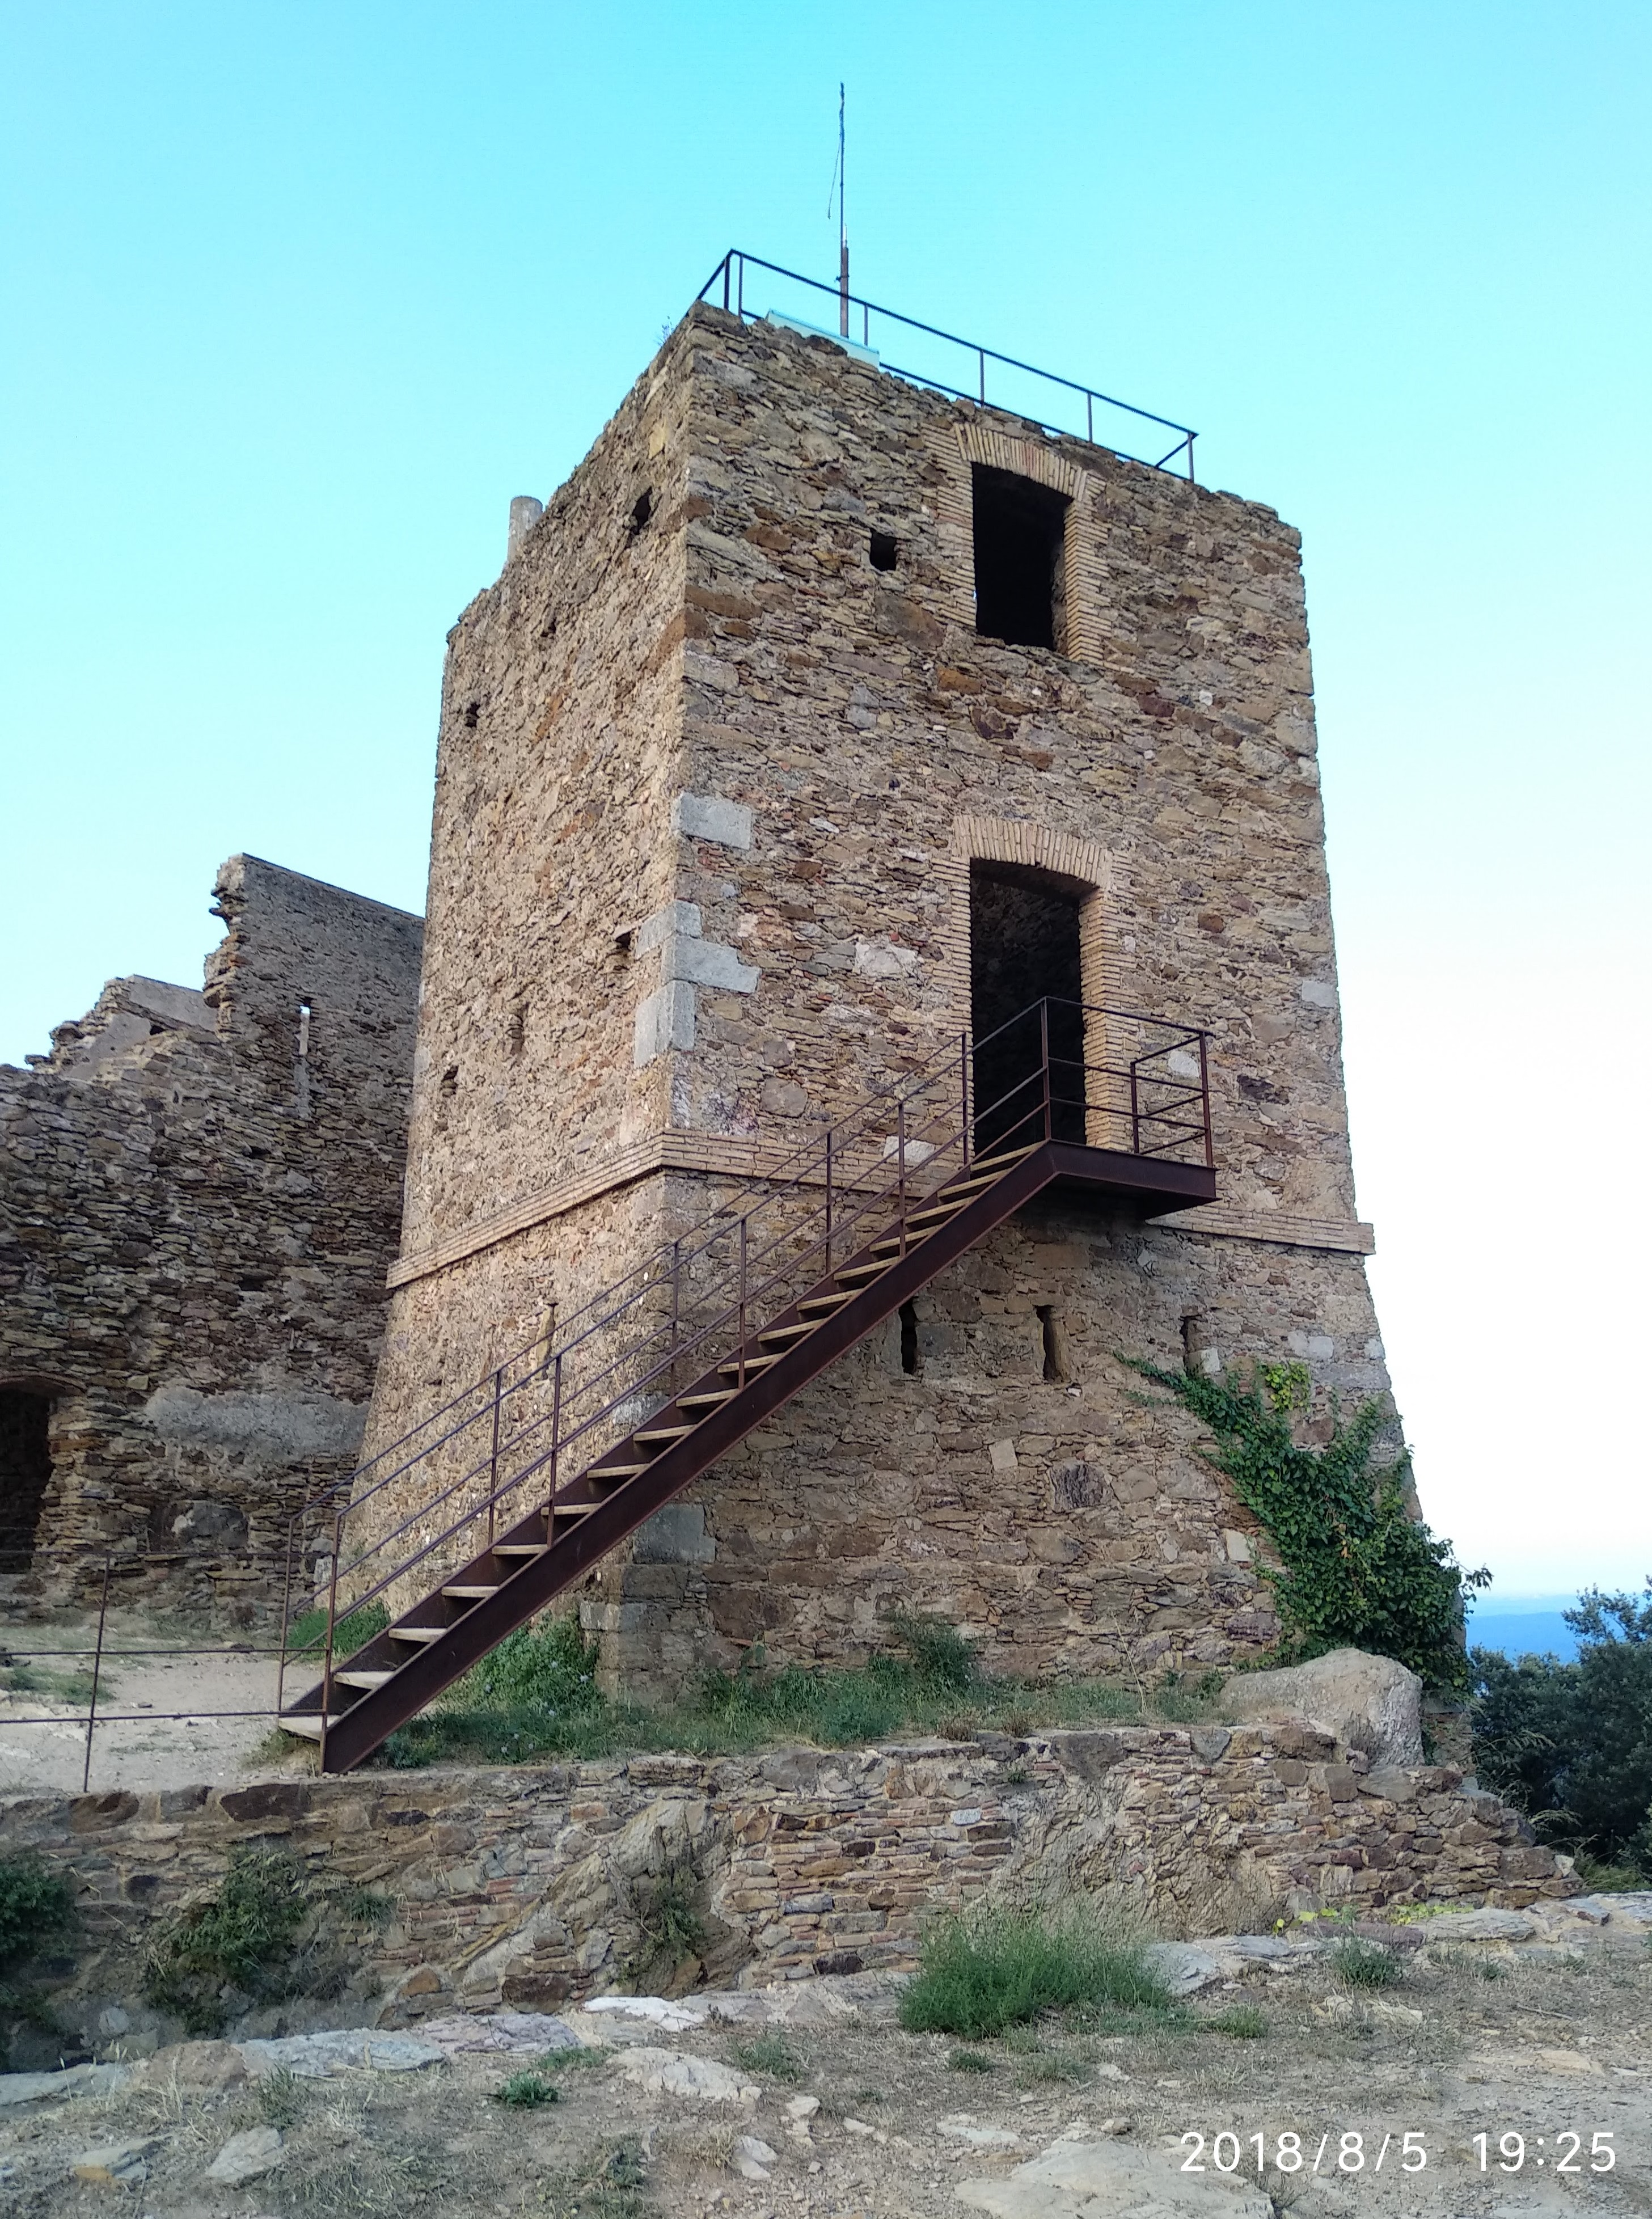 telegrafia òptica civil Torre Sant Miquel Celrà